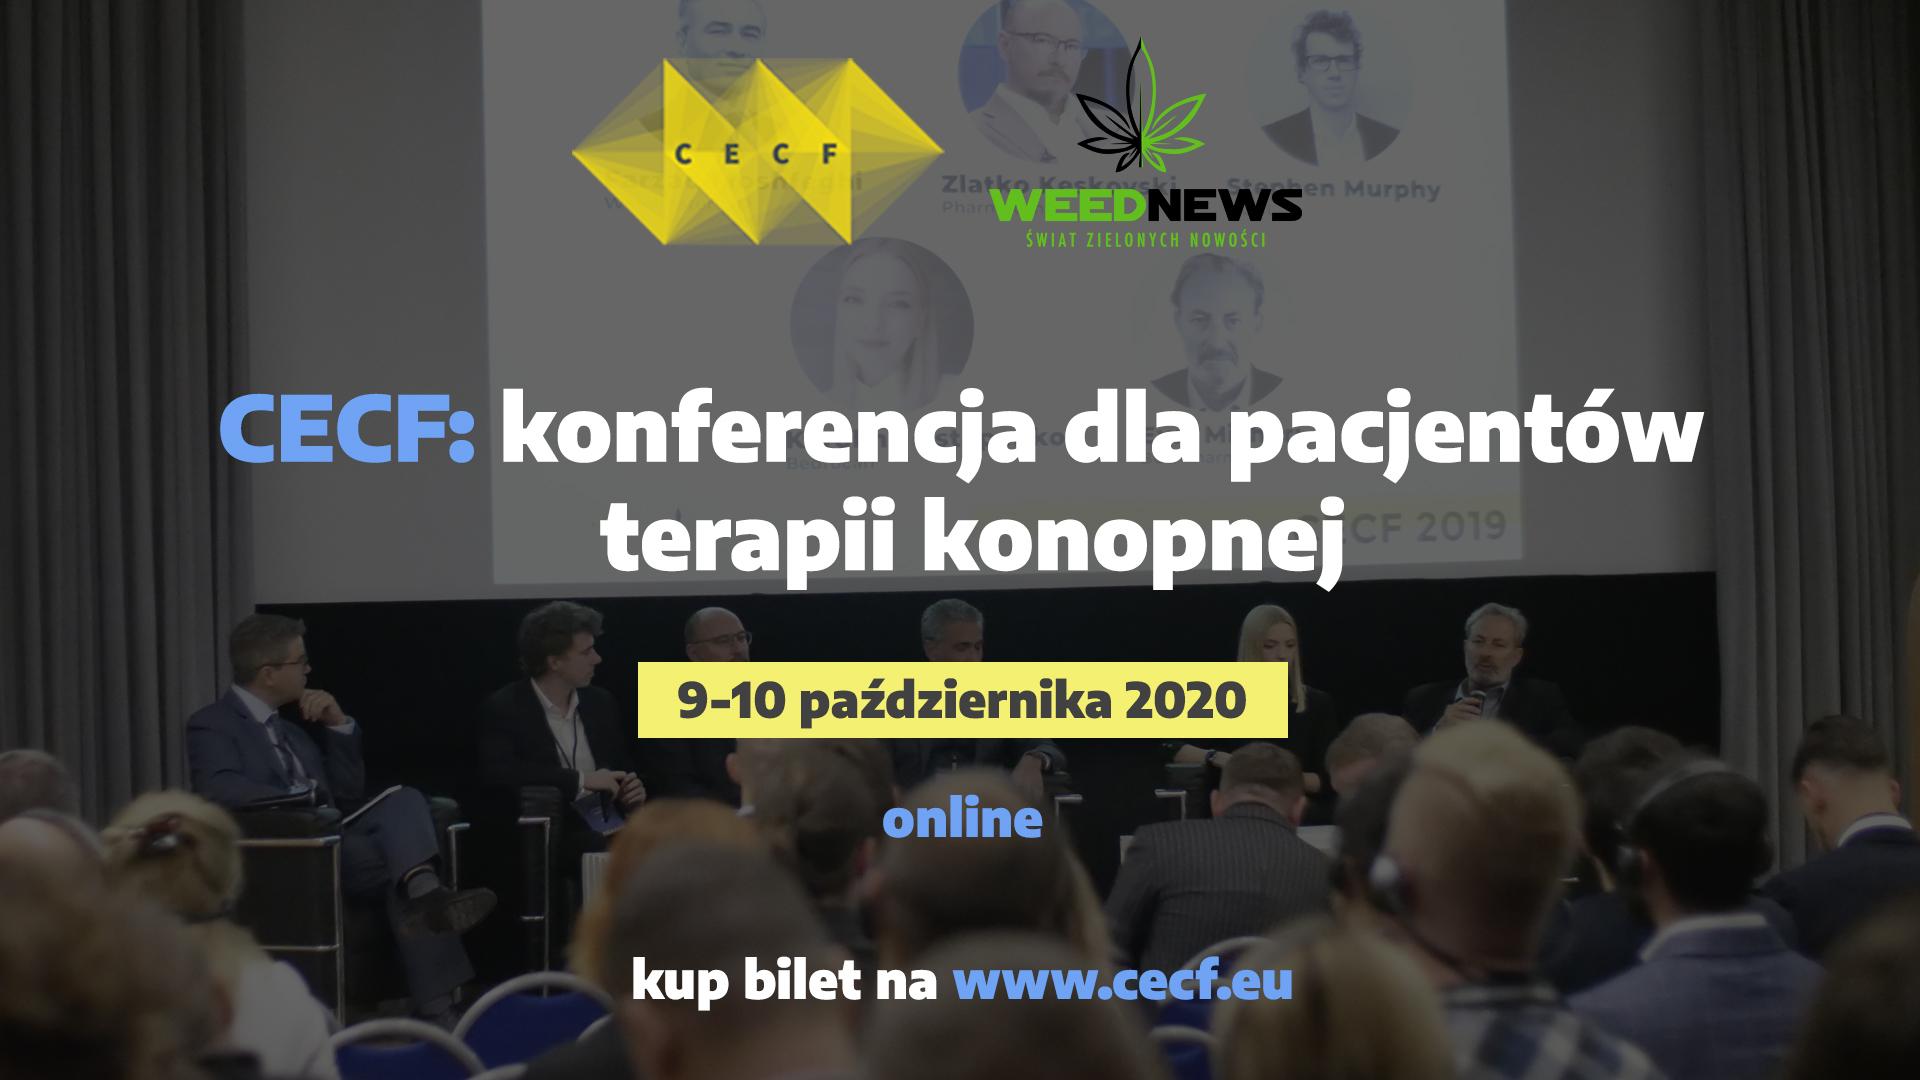 konferencja konopna